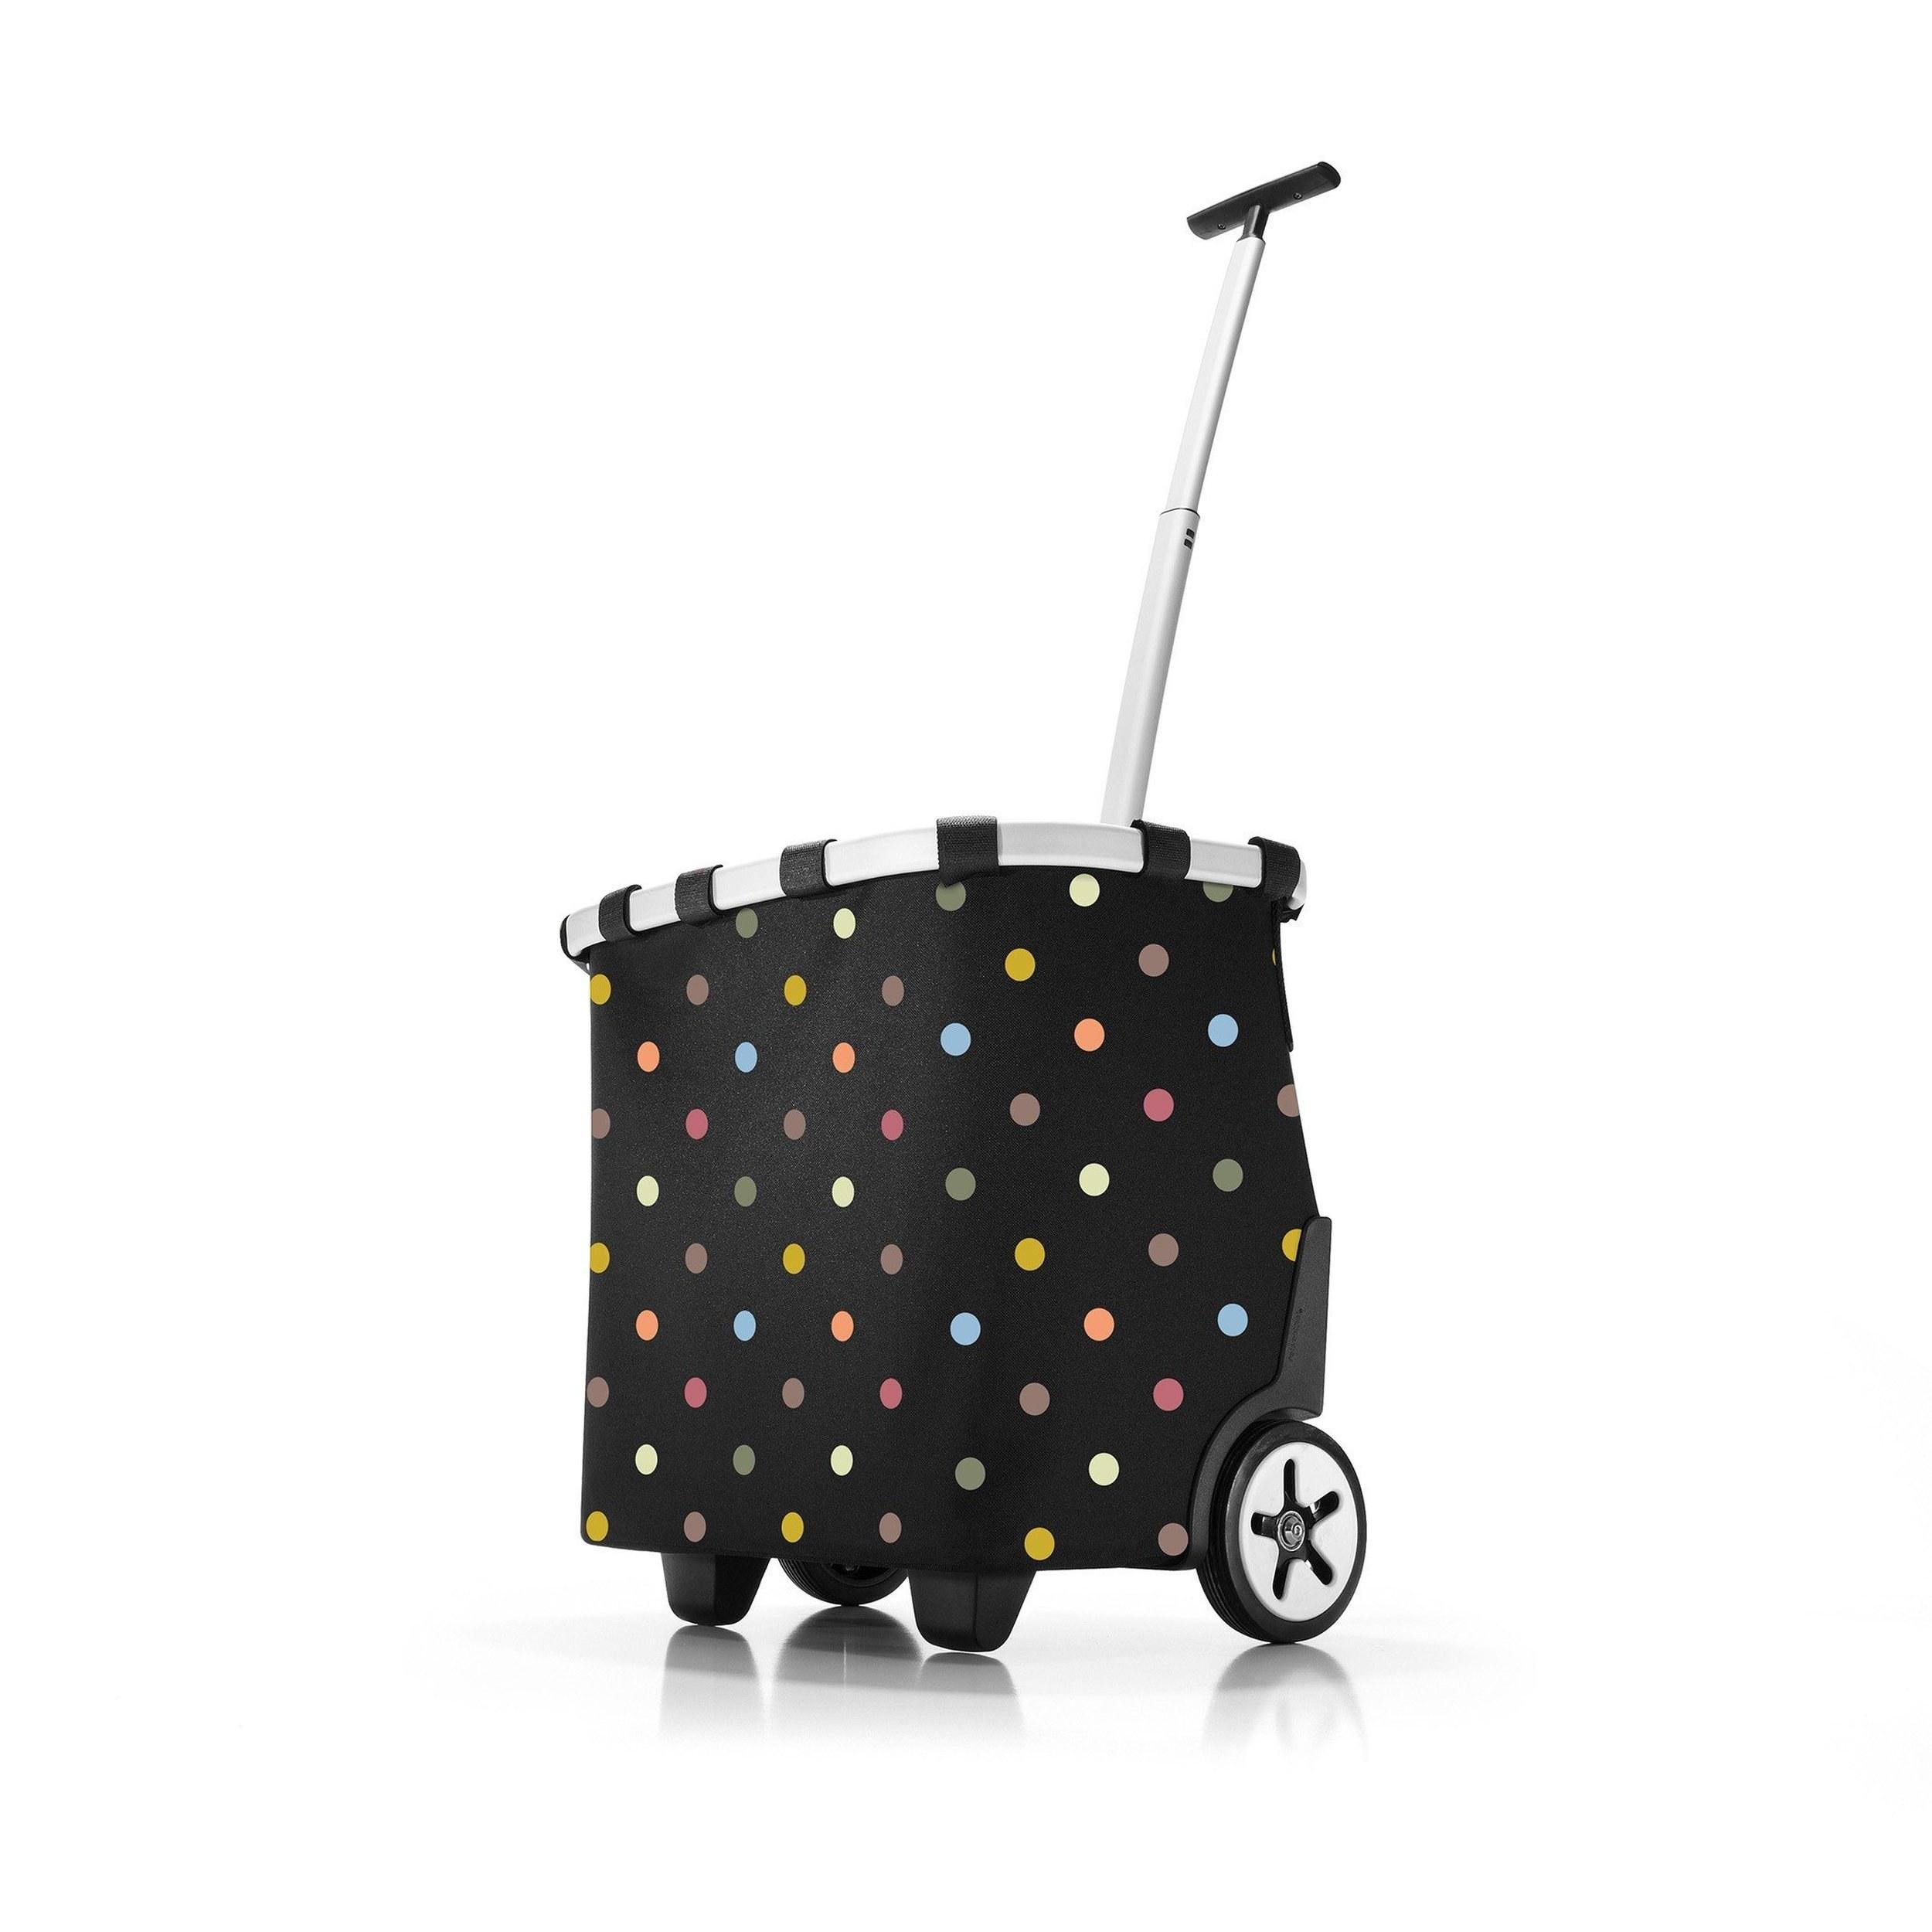 koszyk na k kach carrycruiser reisenthel. Black Bedroom Furniture Sets. Home Design Ideas